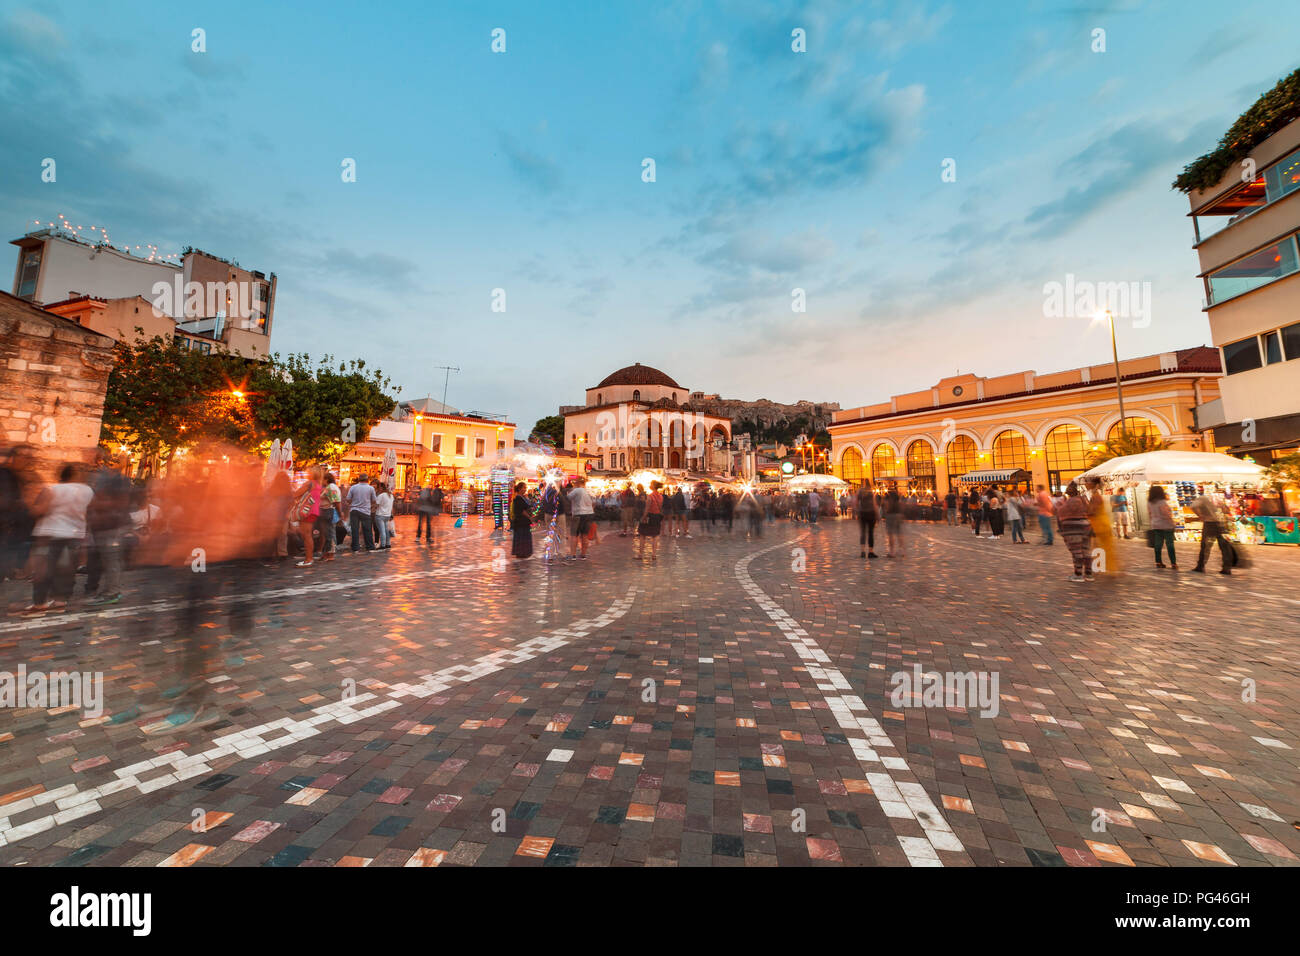 Long Exposure, wide shot at night, Monastiraki square Athens Greece - Stock Image